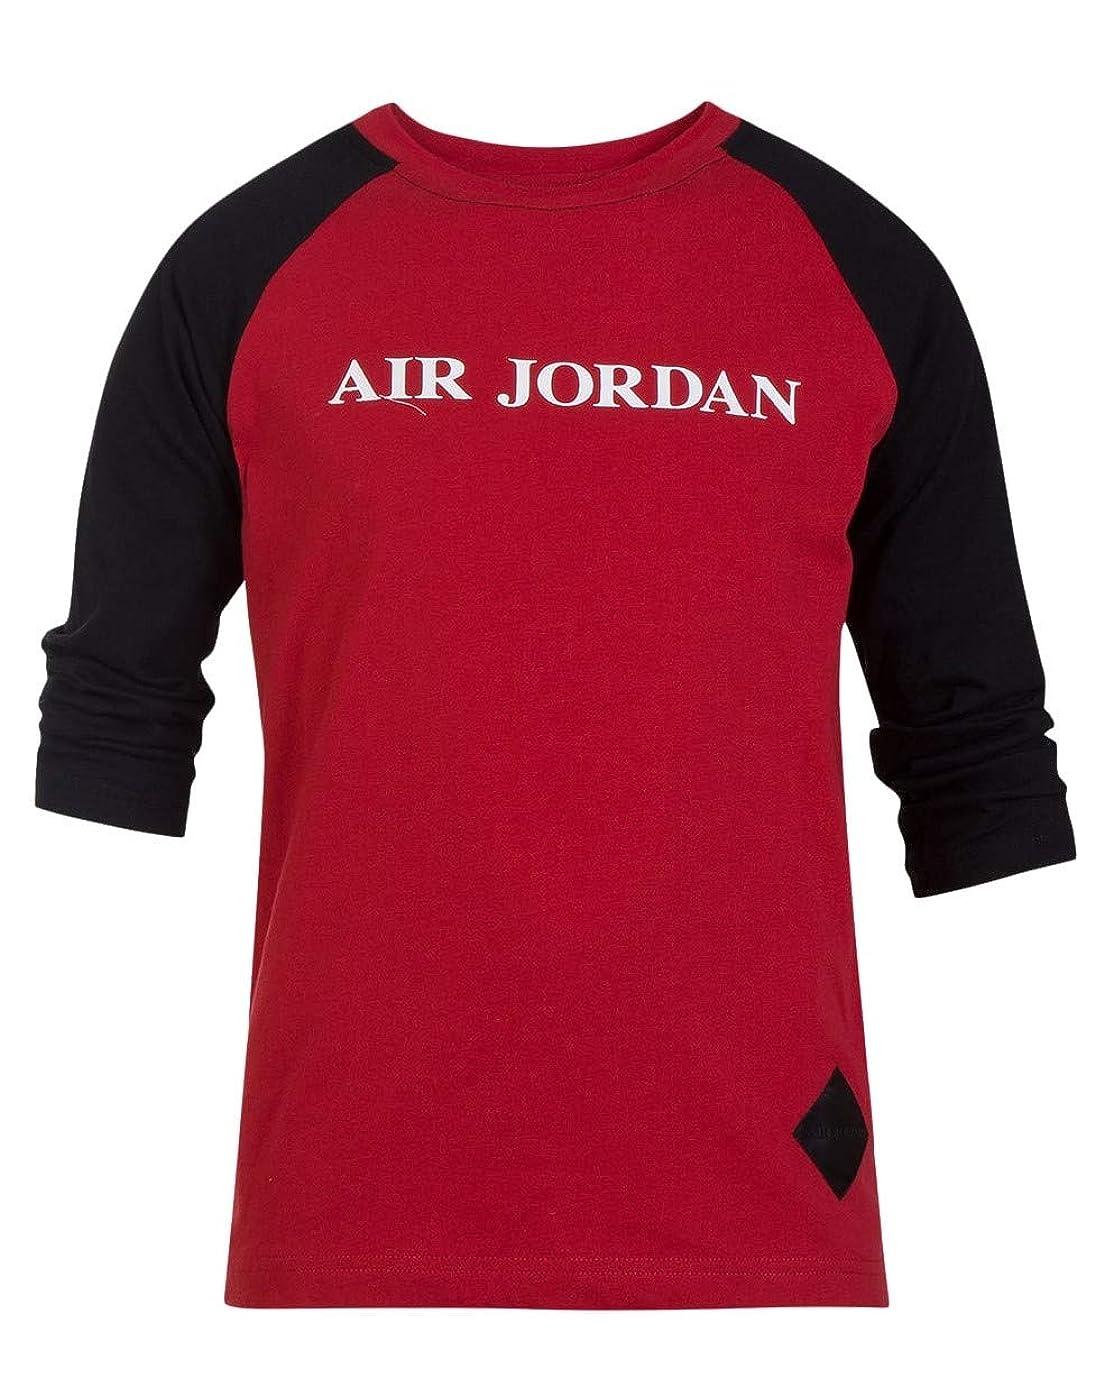 Jordan Nike Big Boys' Raglan Long Sleeves Cotton T-Shirt